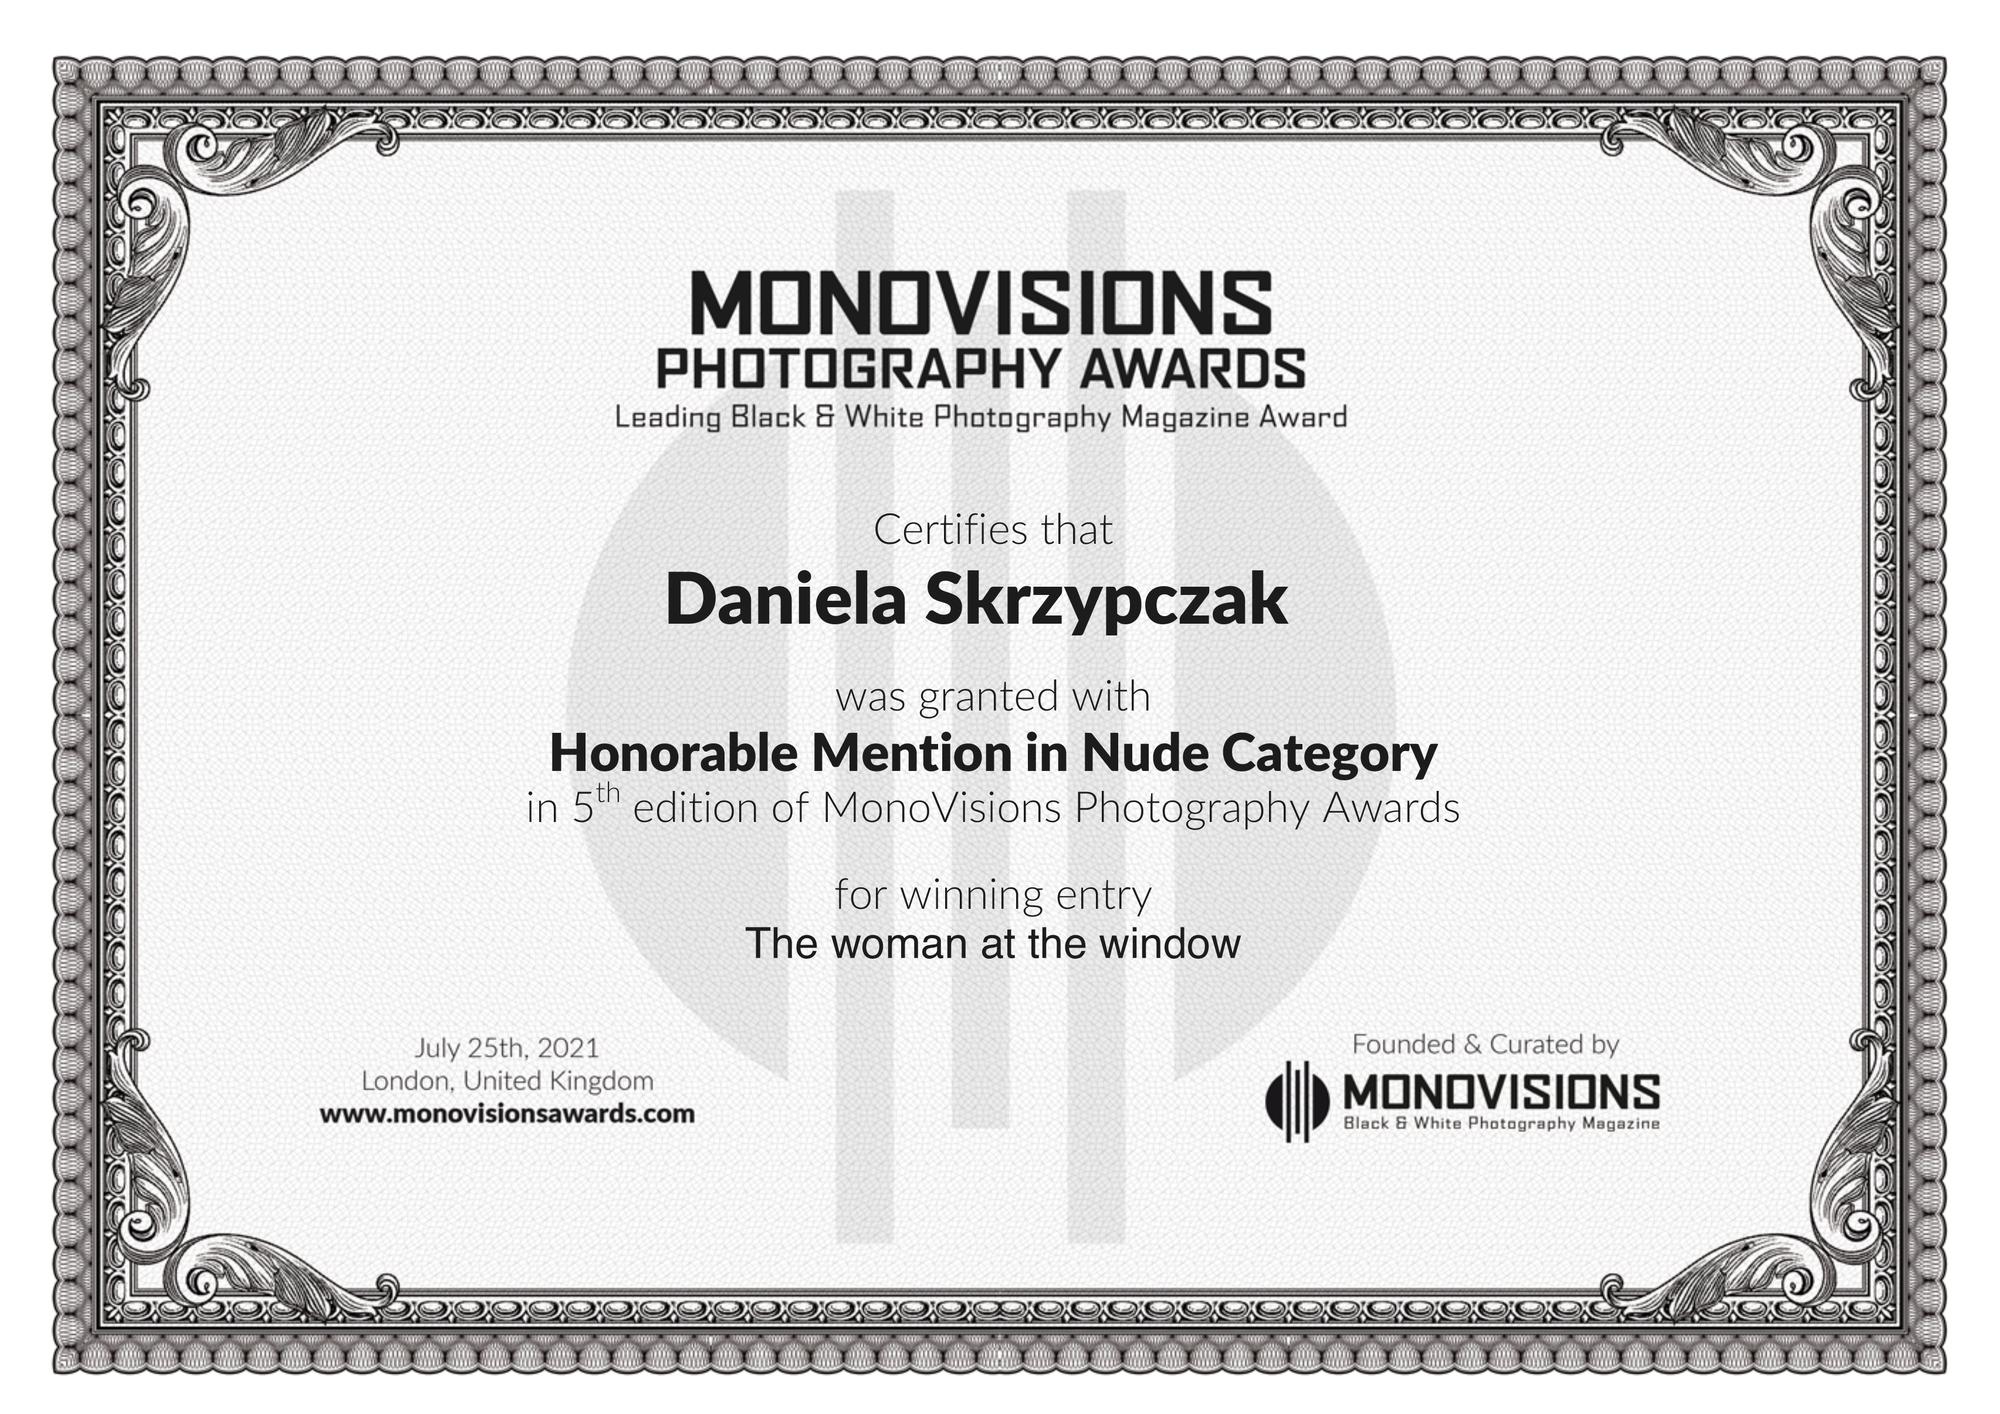 Monovisions Photography Award